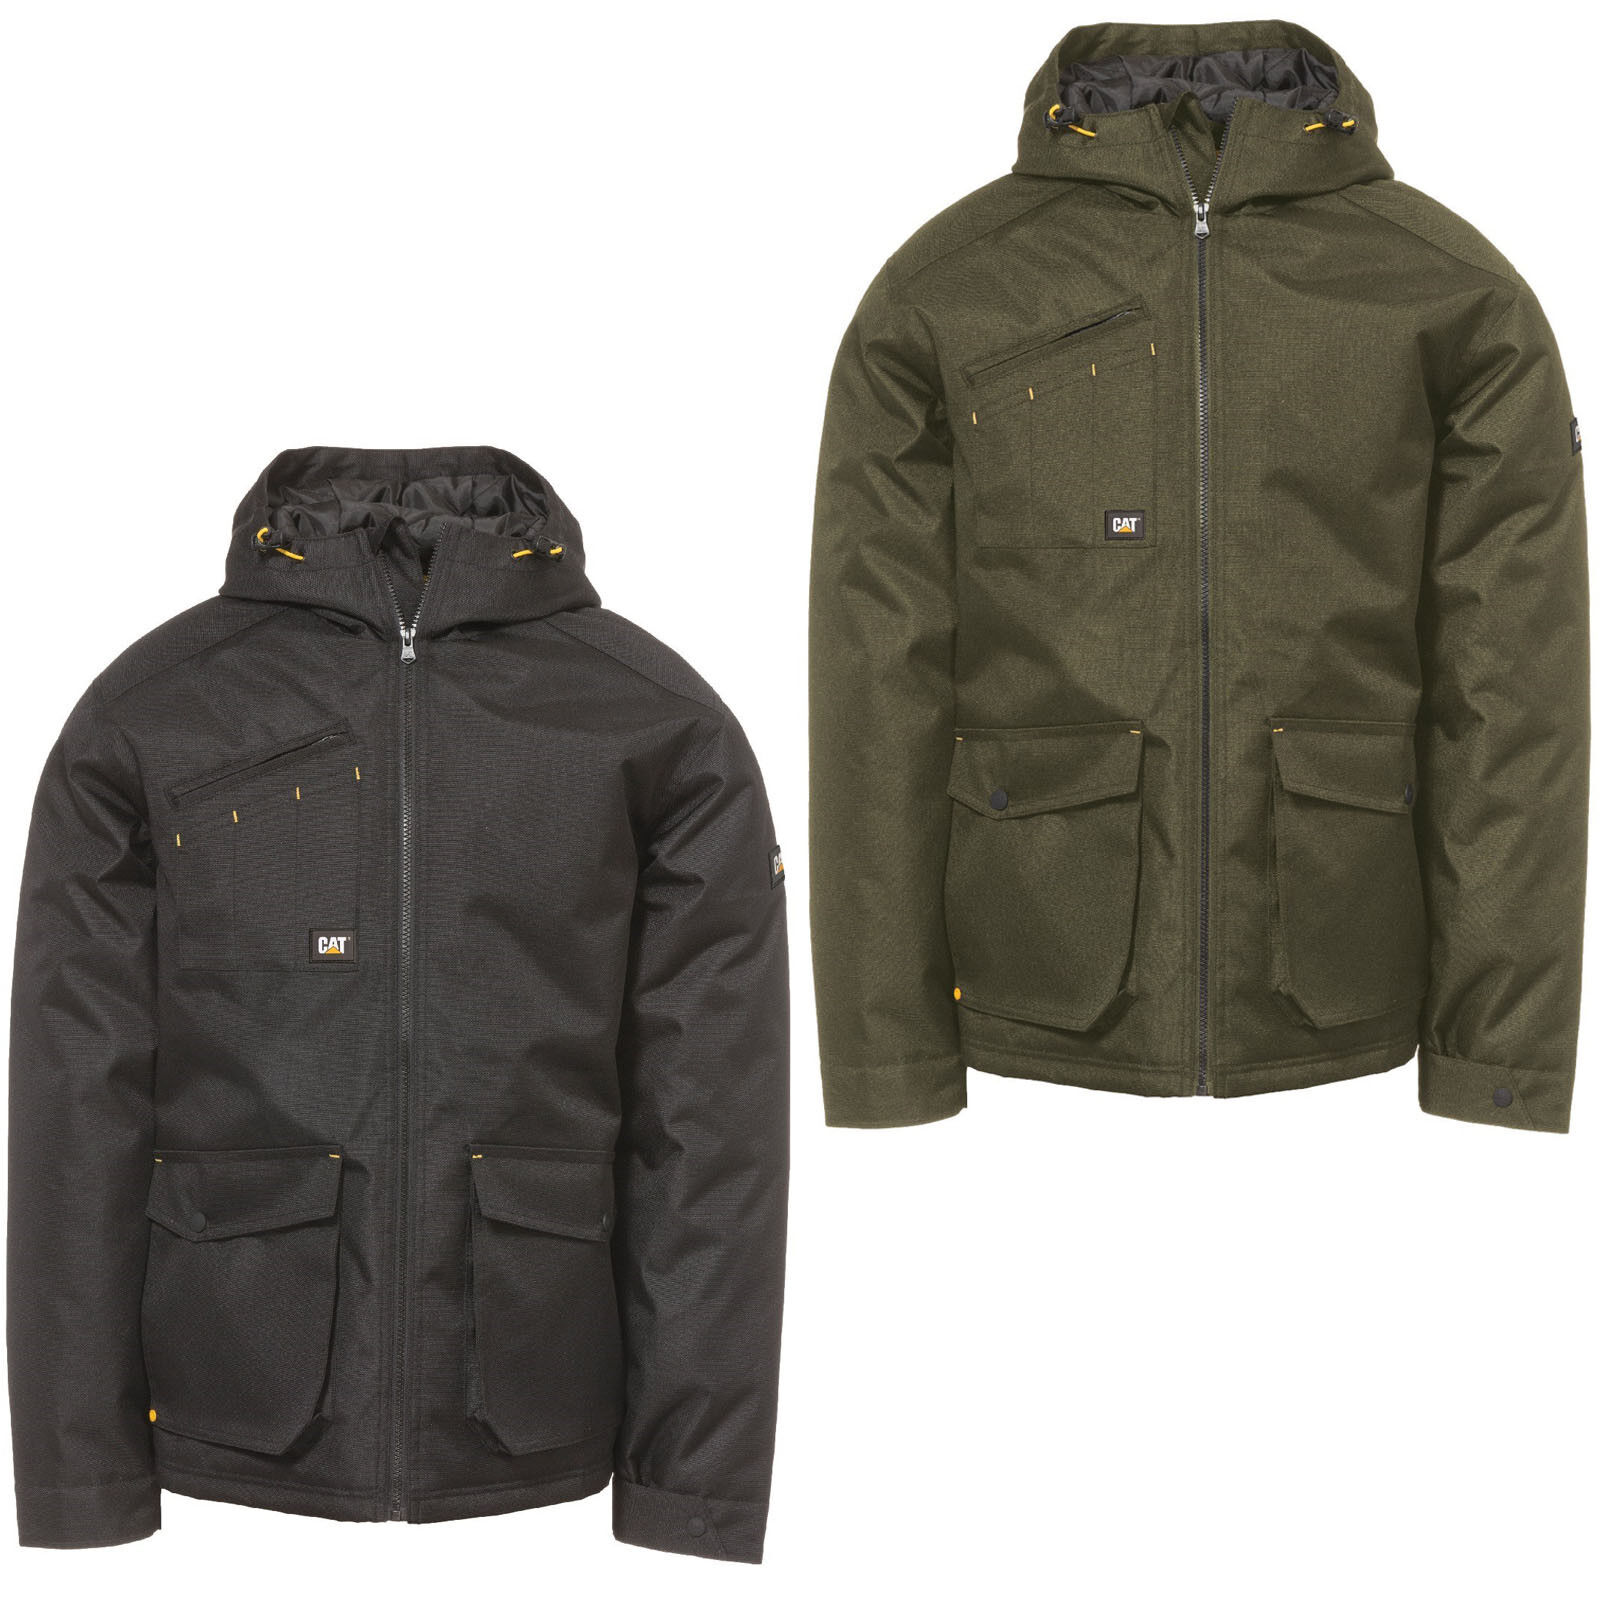 81e33e5fccab CAT Caterpillar Battleridge Jacket Mens Insulated Water Resistant Workwear  Coat